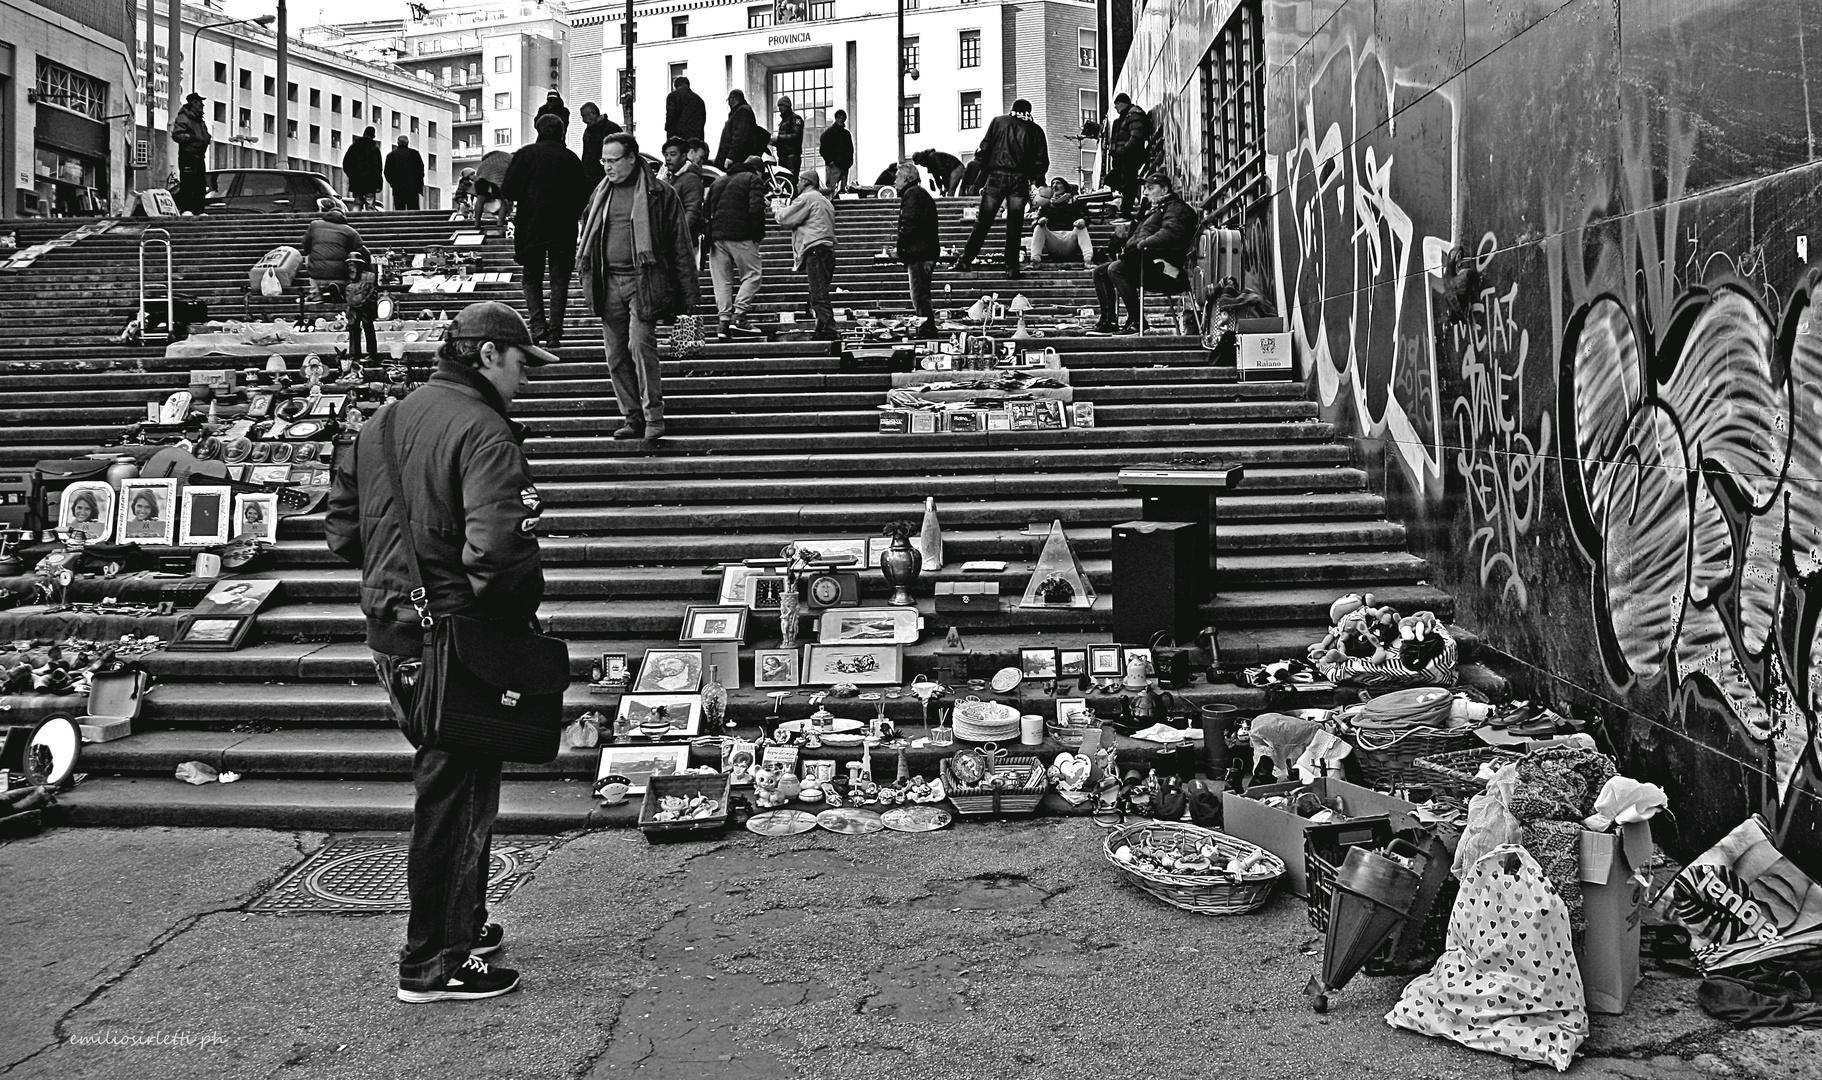 il mercatino dei ricordi  -  the little market of the memoirs